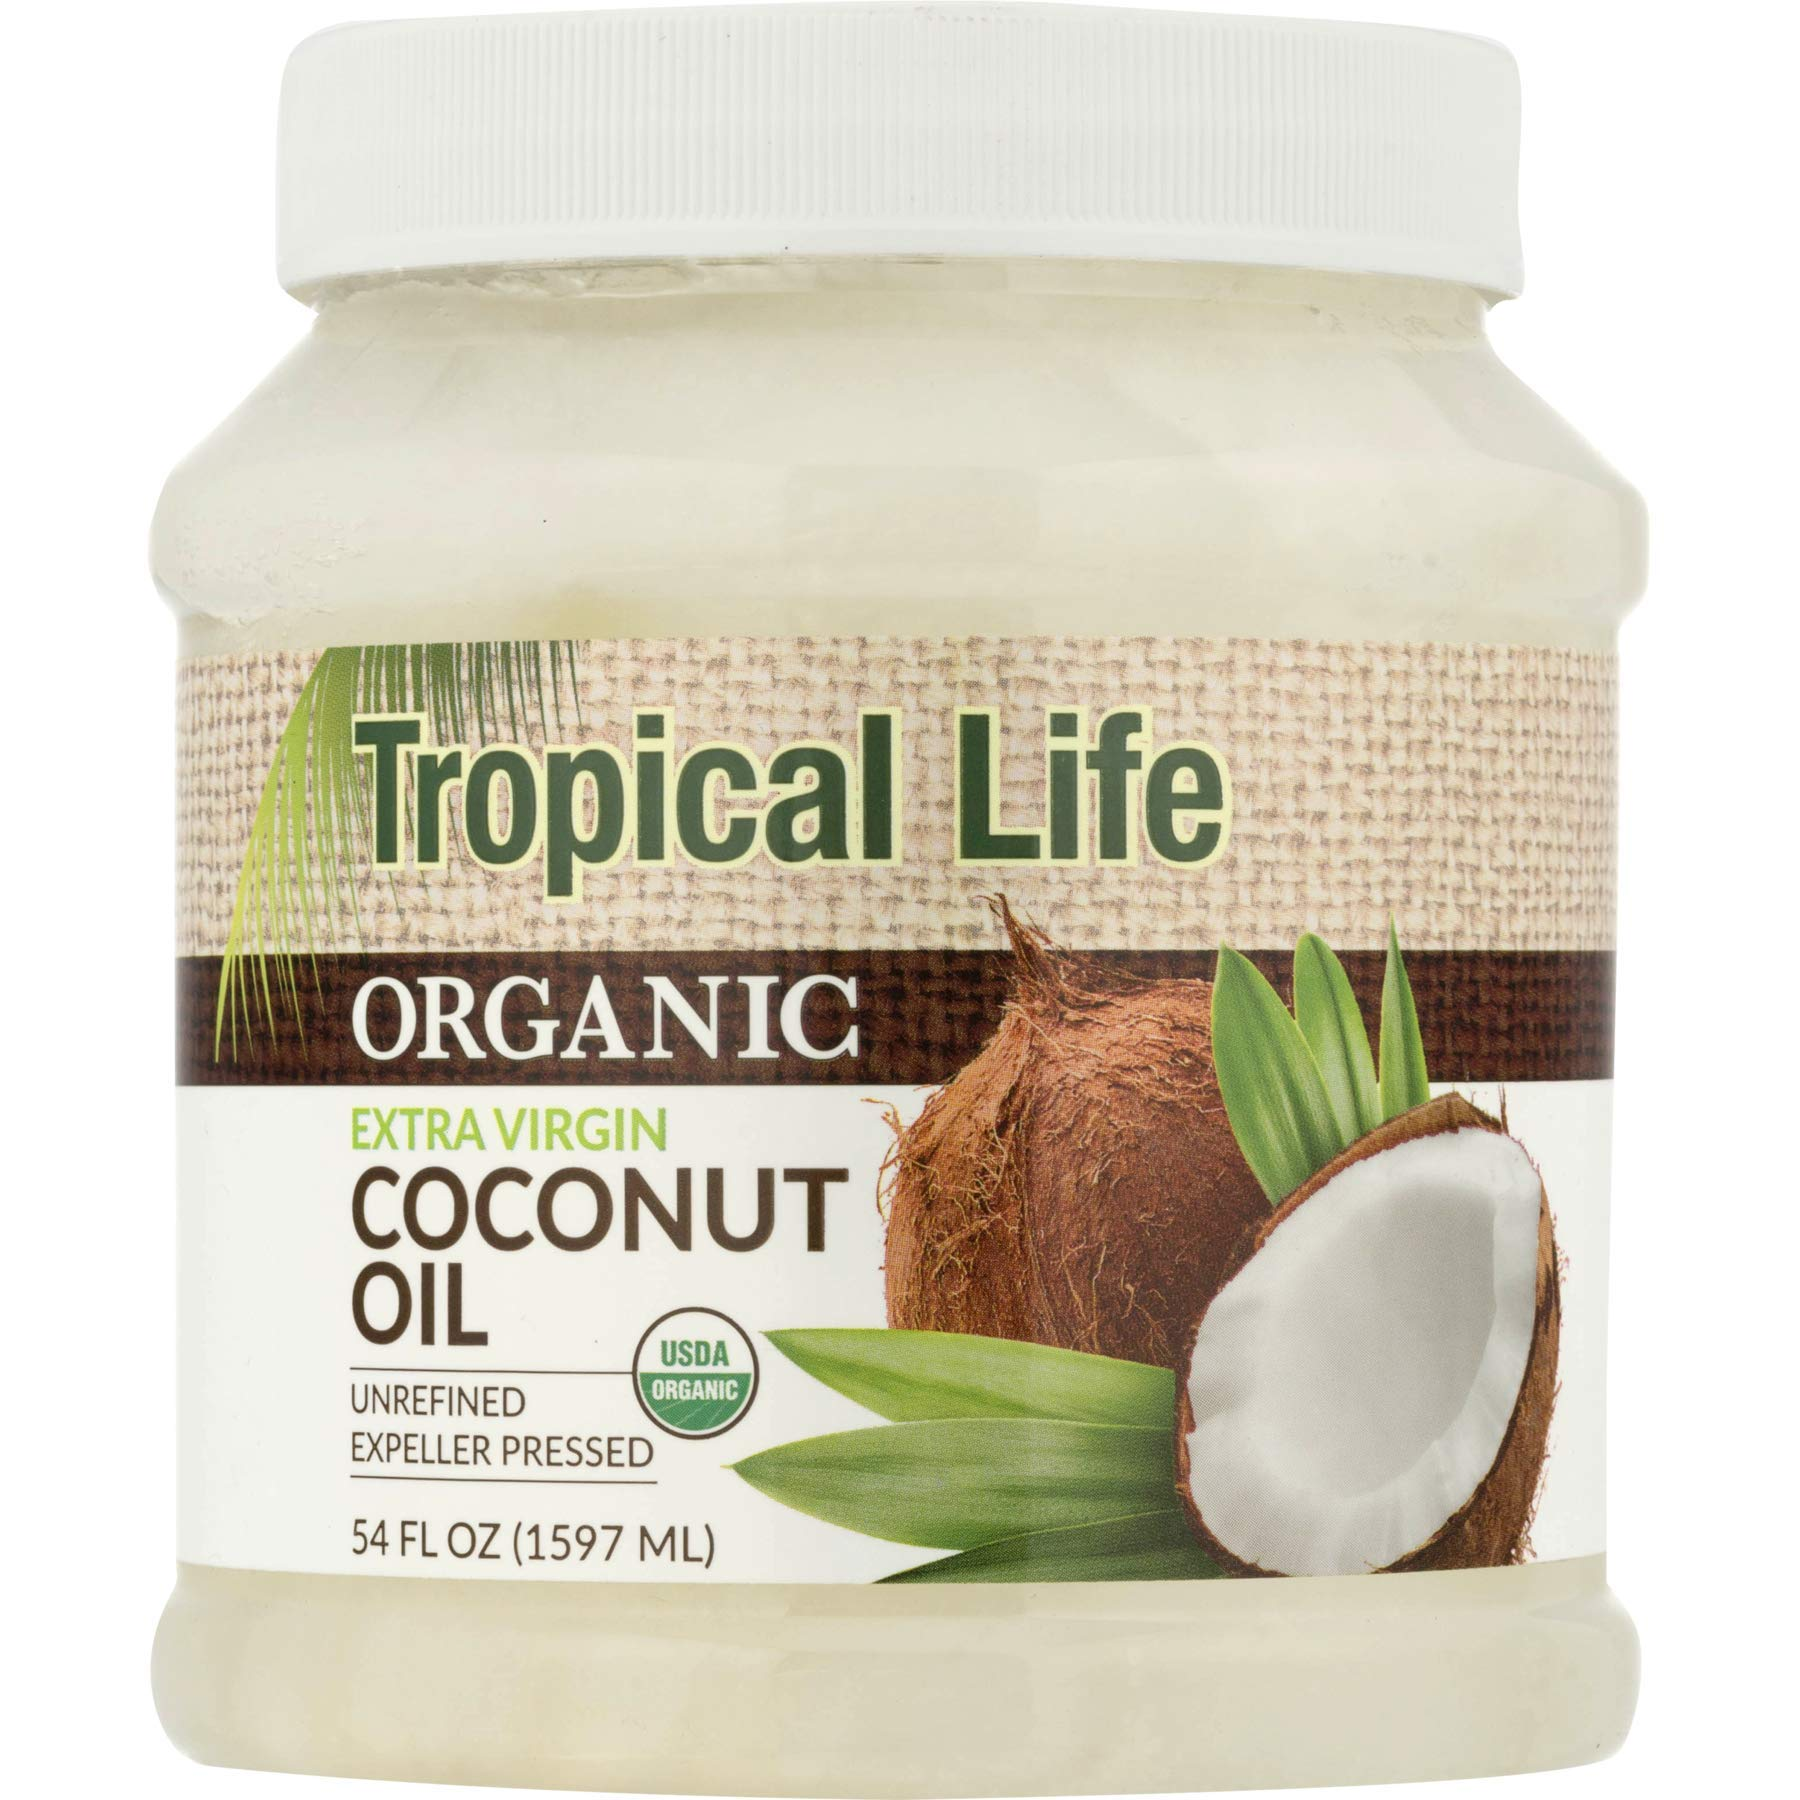 PACK OF 3 - Carrington Farms Tropical Life Organic Extra Virgin Coconut Oil, 54.0 FL OZ by Tropical Life